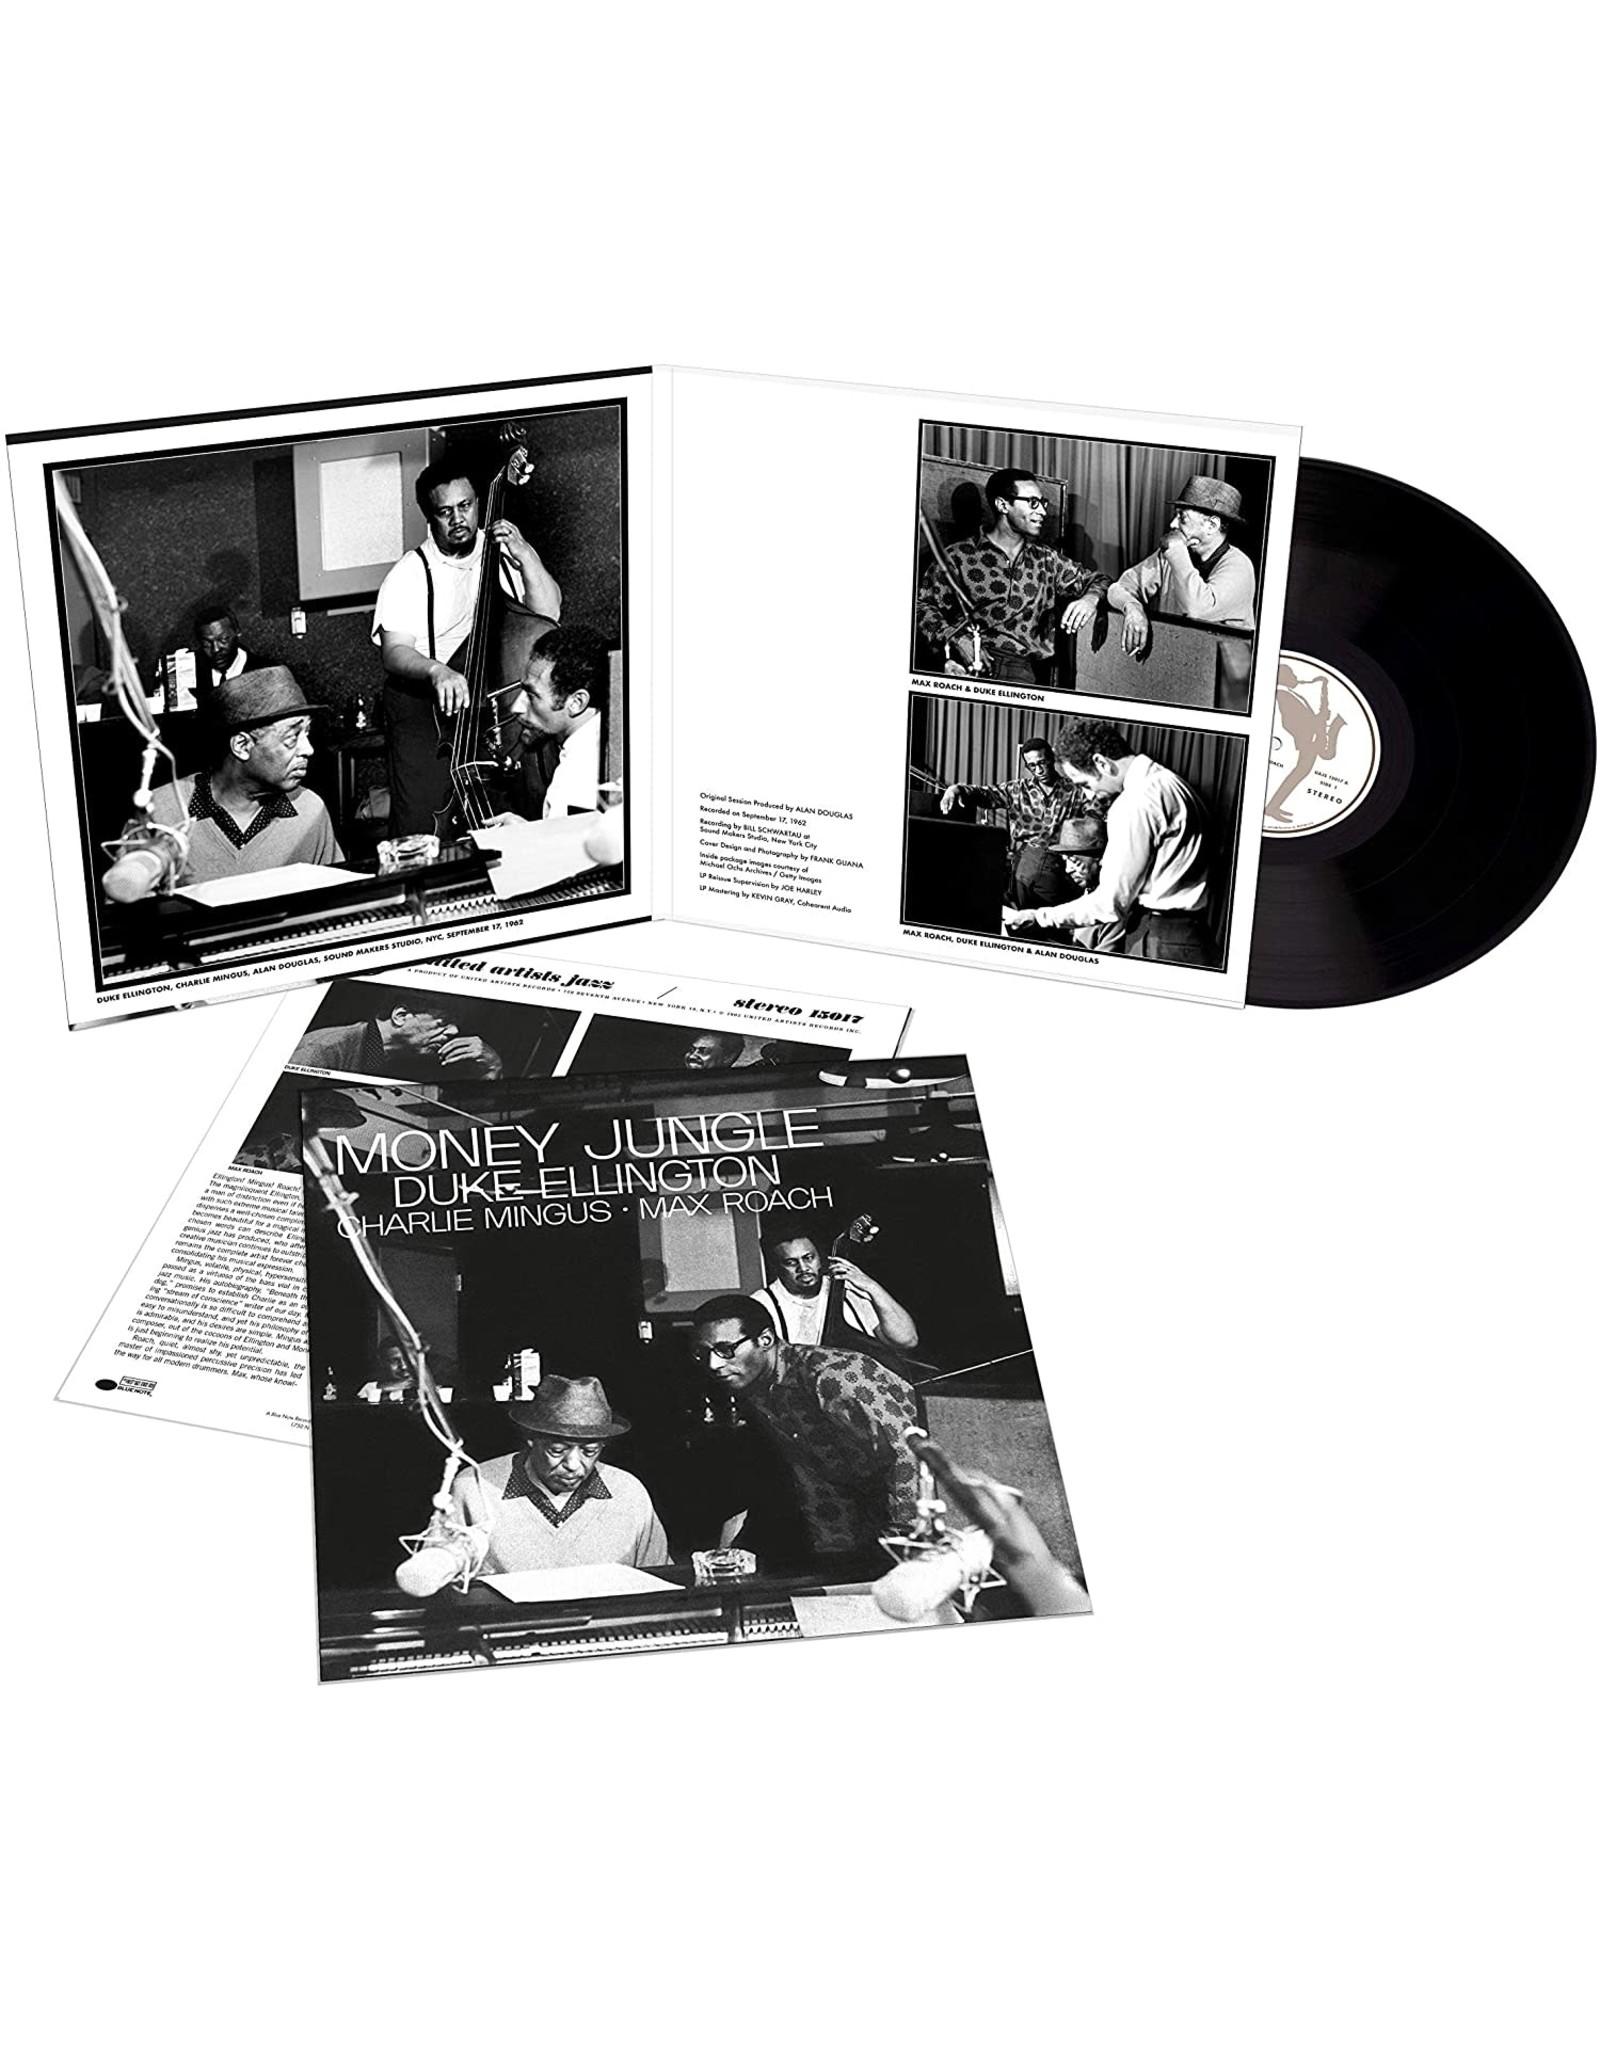 Duke Ellington - Money Jungle (Blue Note Tone Poet)